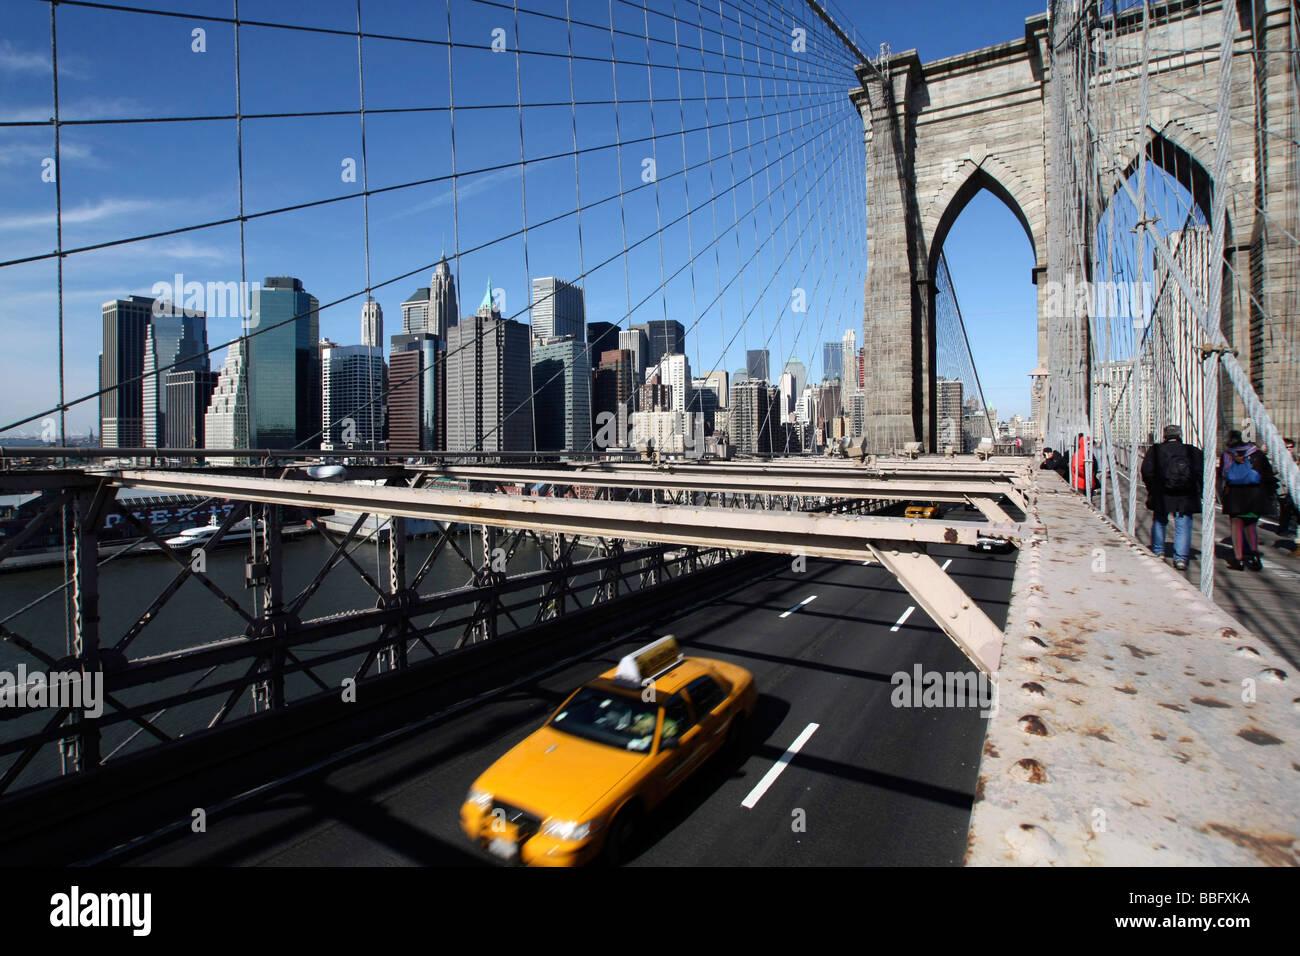 Brooklyn Bridge, Manhattan, New York City, NYC, USA, United States of America - Stock Image